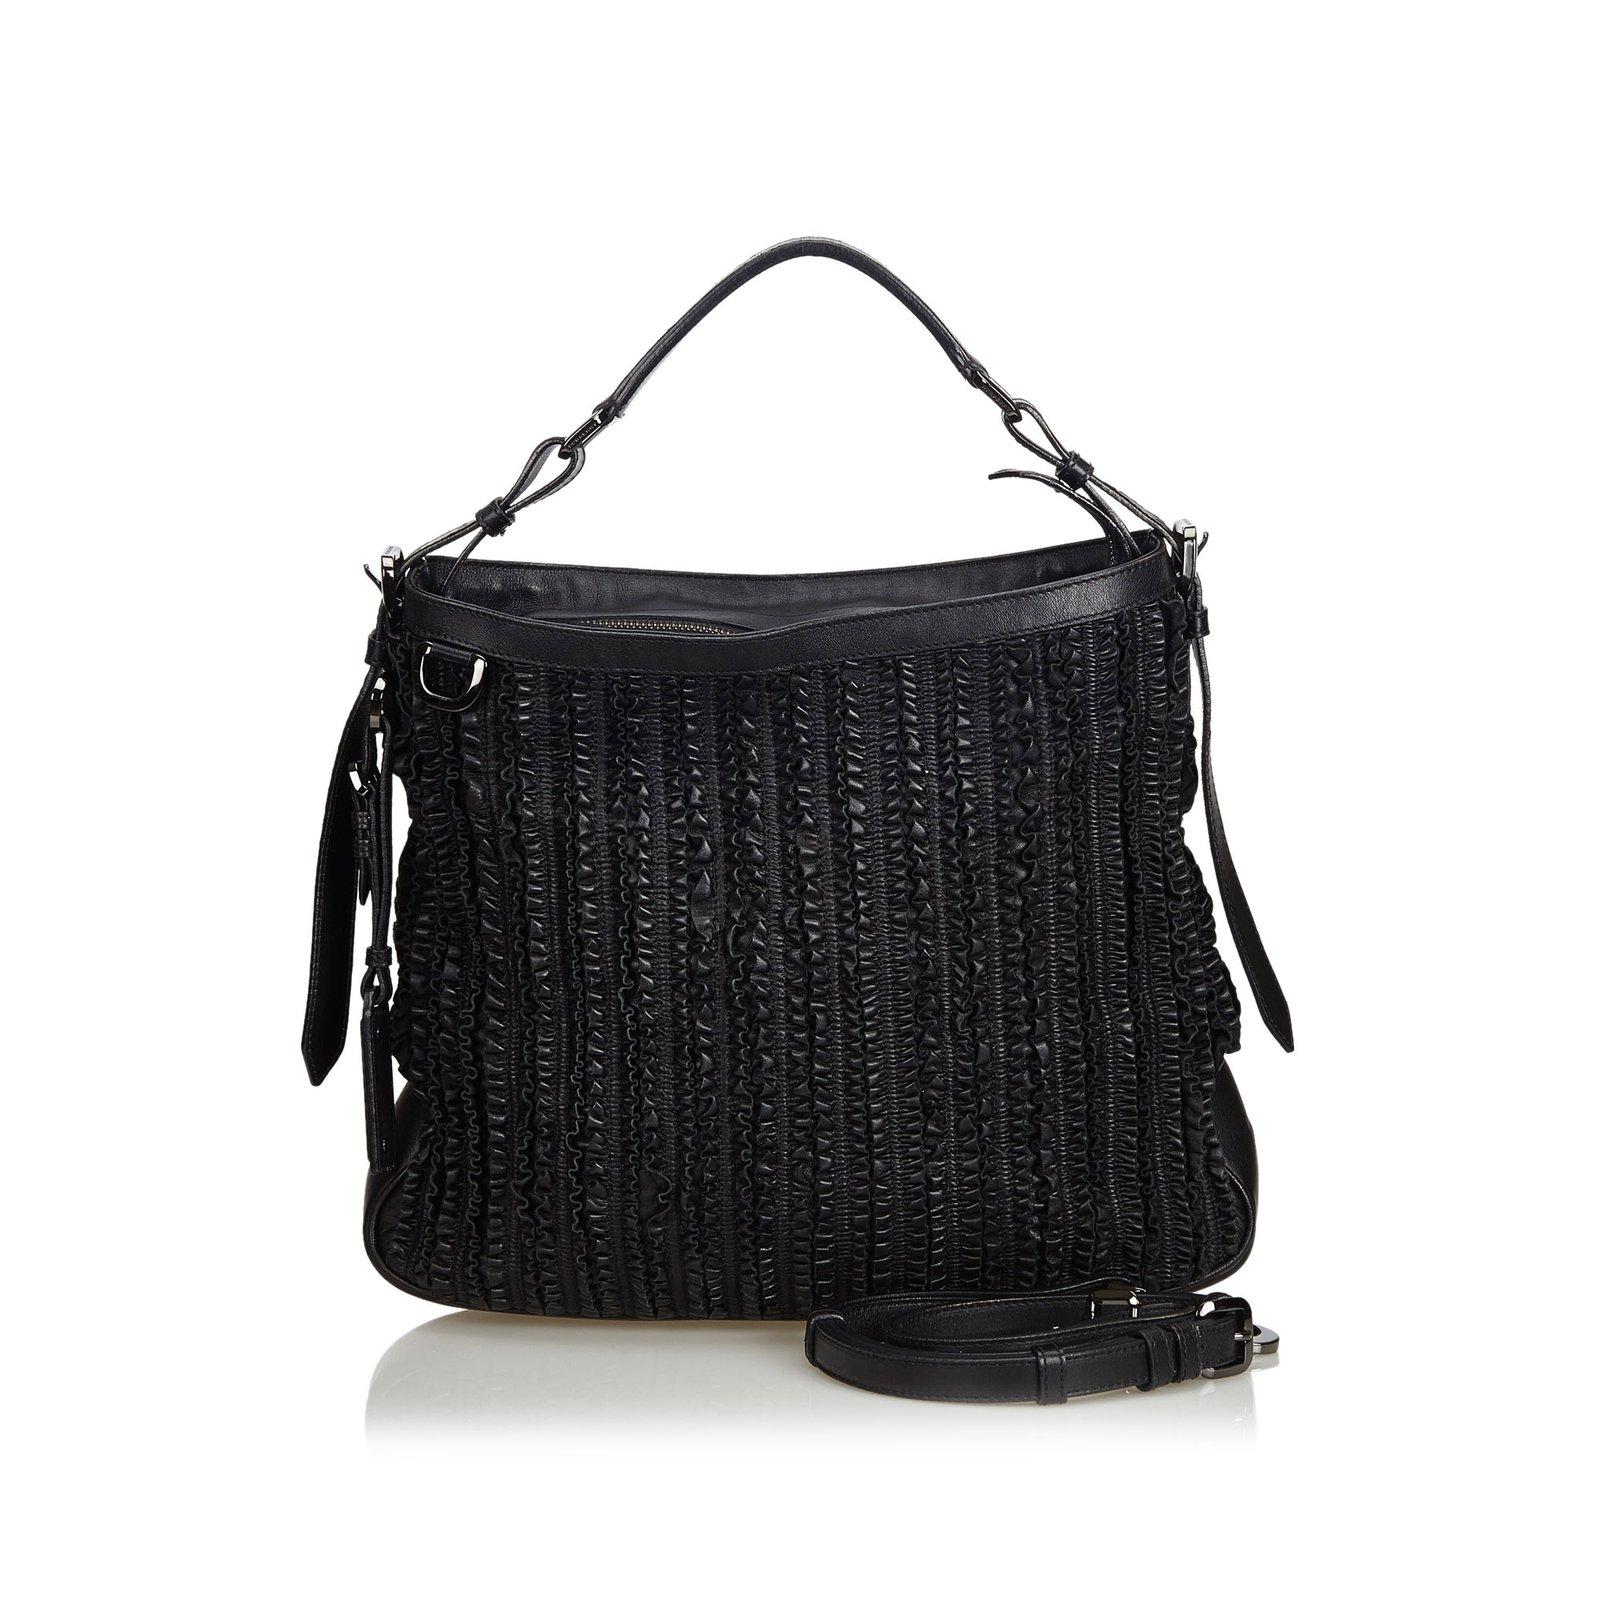 0c47fa0364dd Burberry Frilled Leather Hobo Bag Handbags Leather